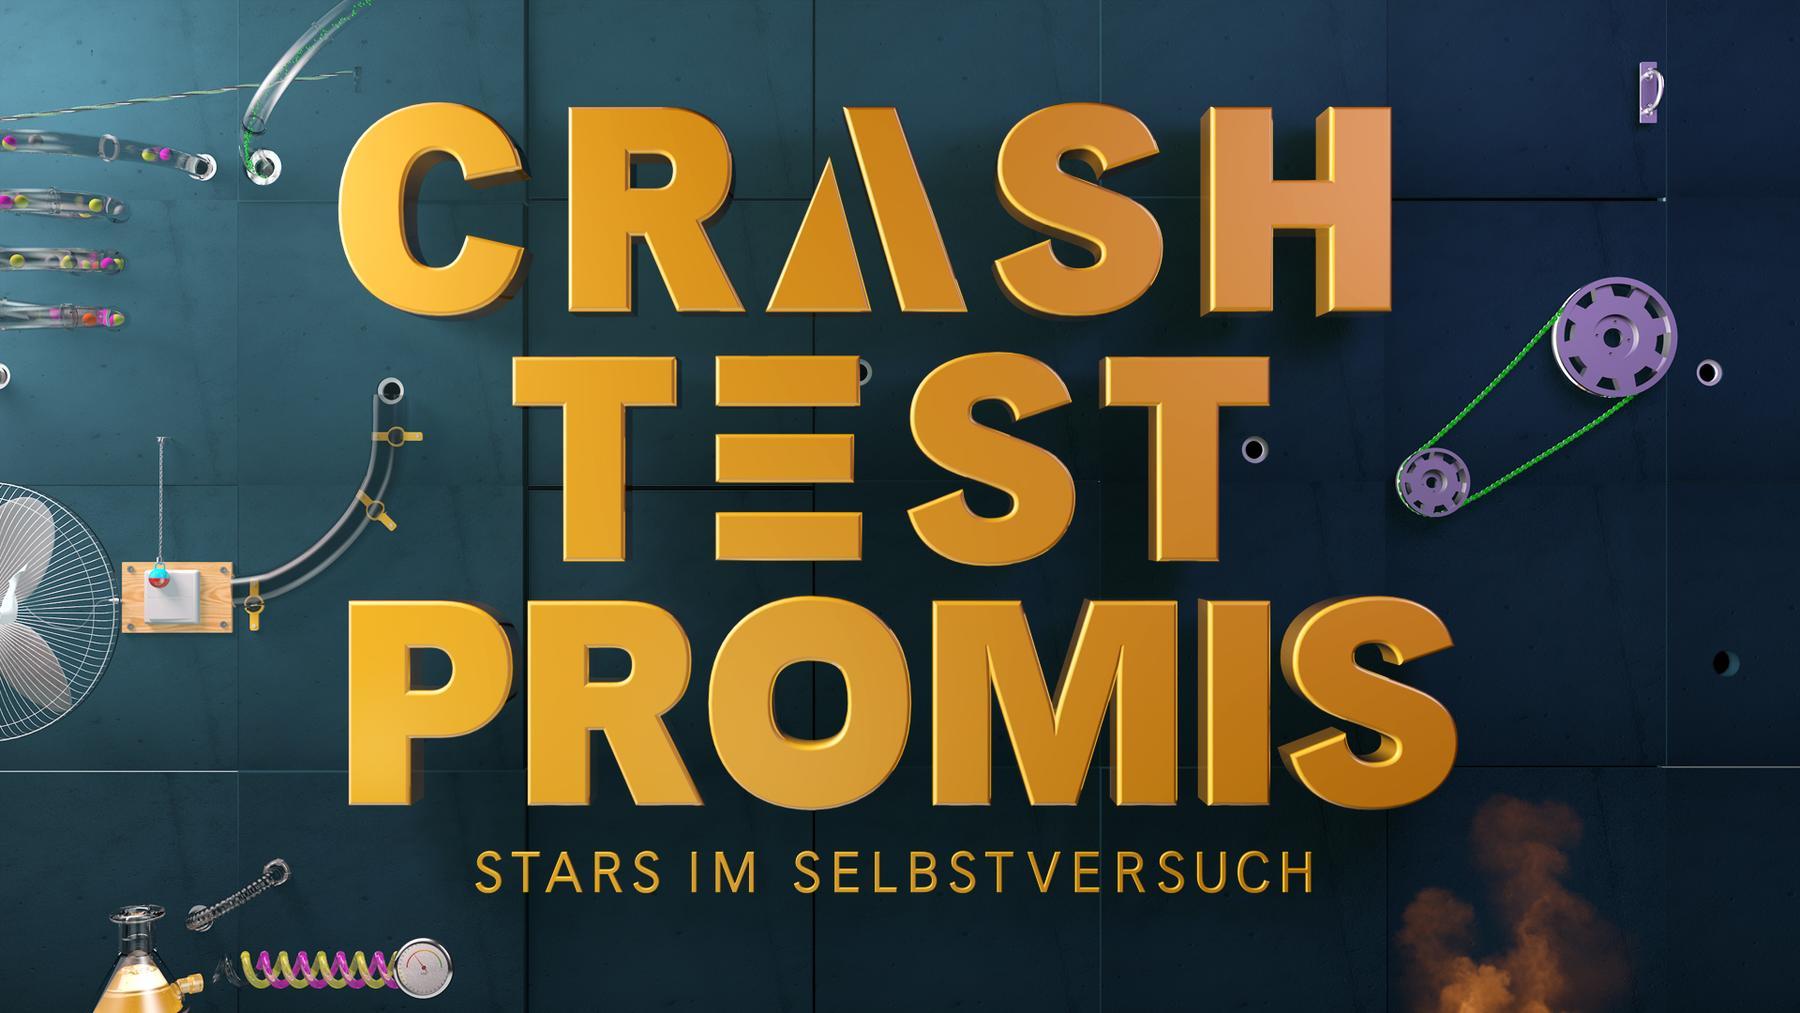 Crash Test Promis - Stars im Selbstversuch